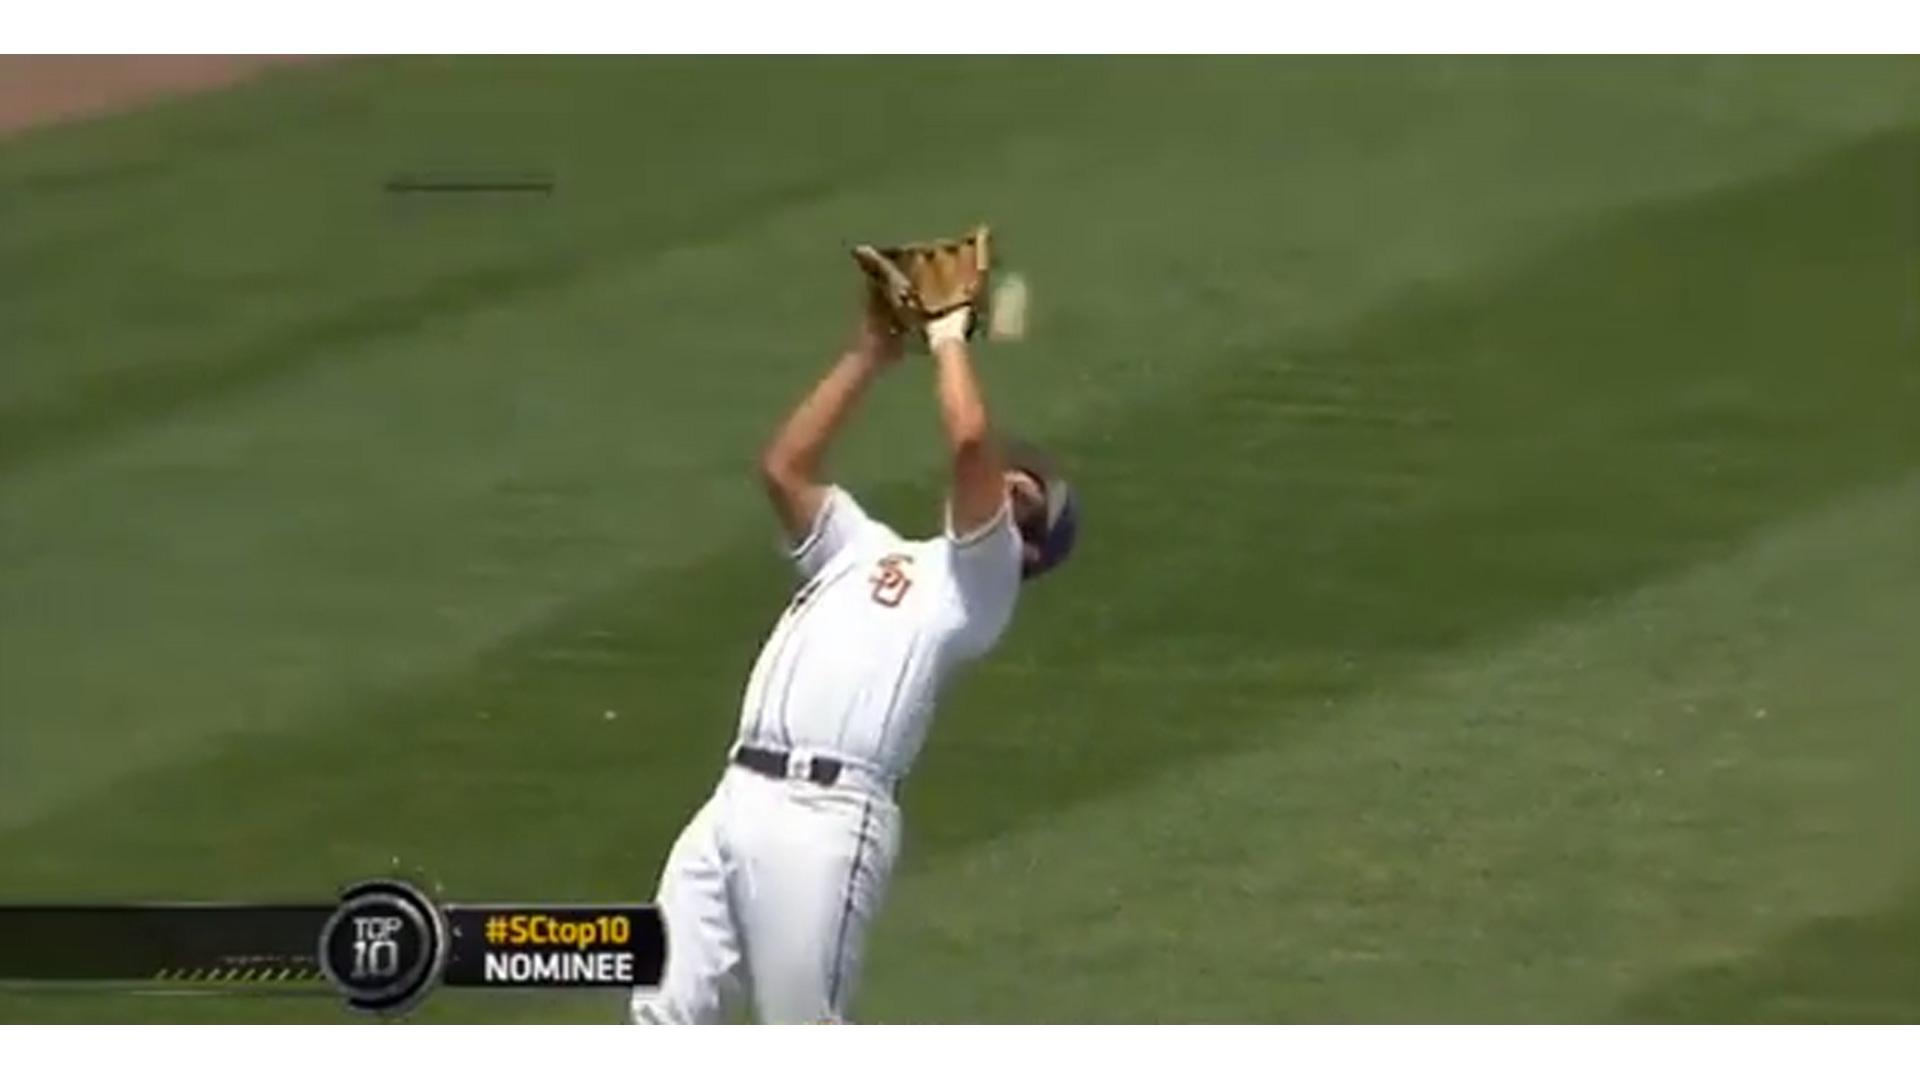 LSU-Tigers-baseball-bounce-052414-youtube-ftr